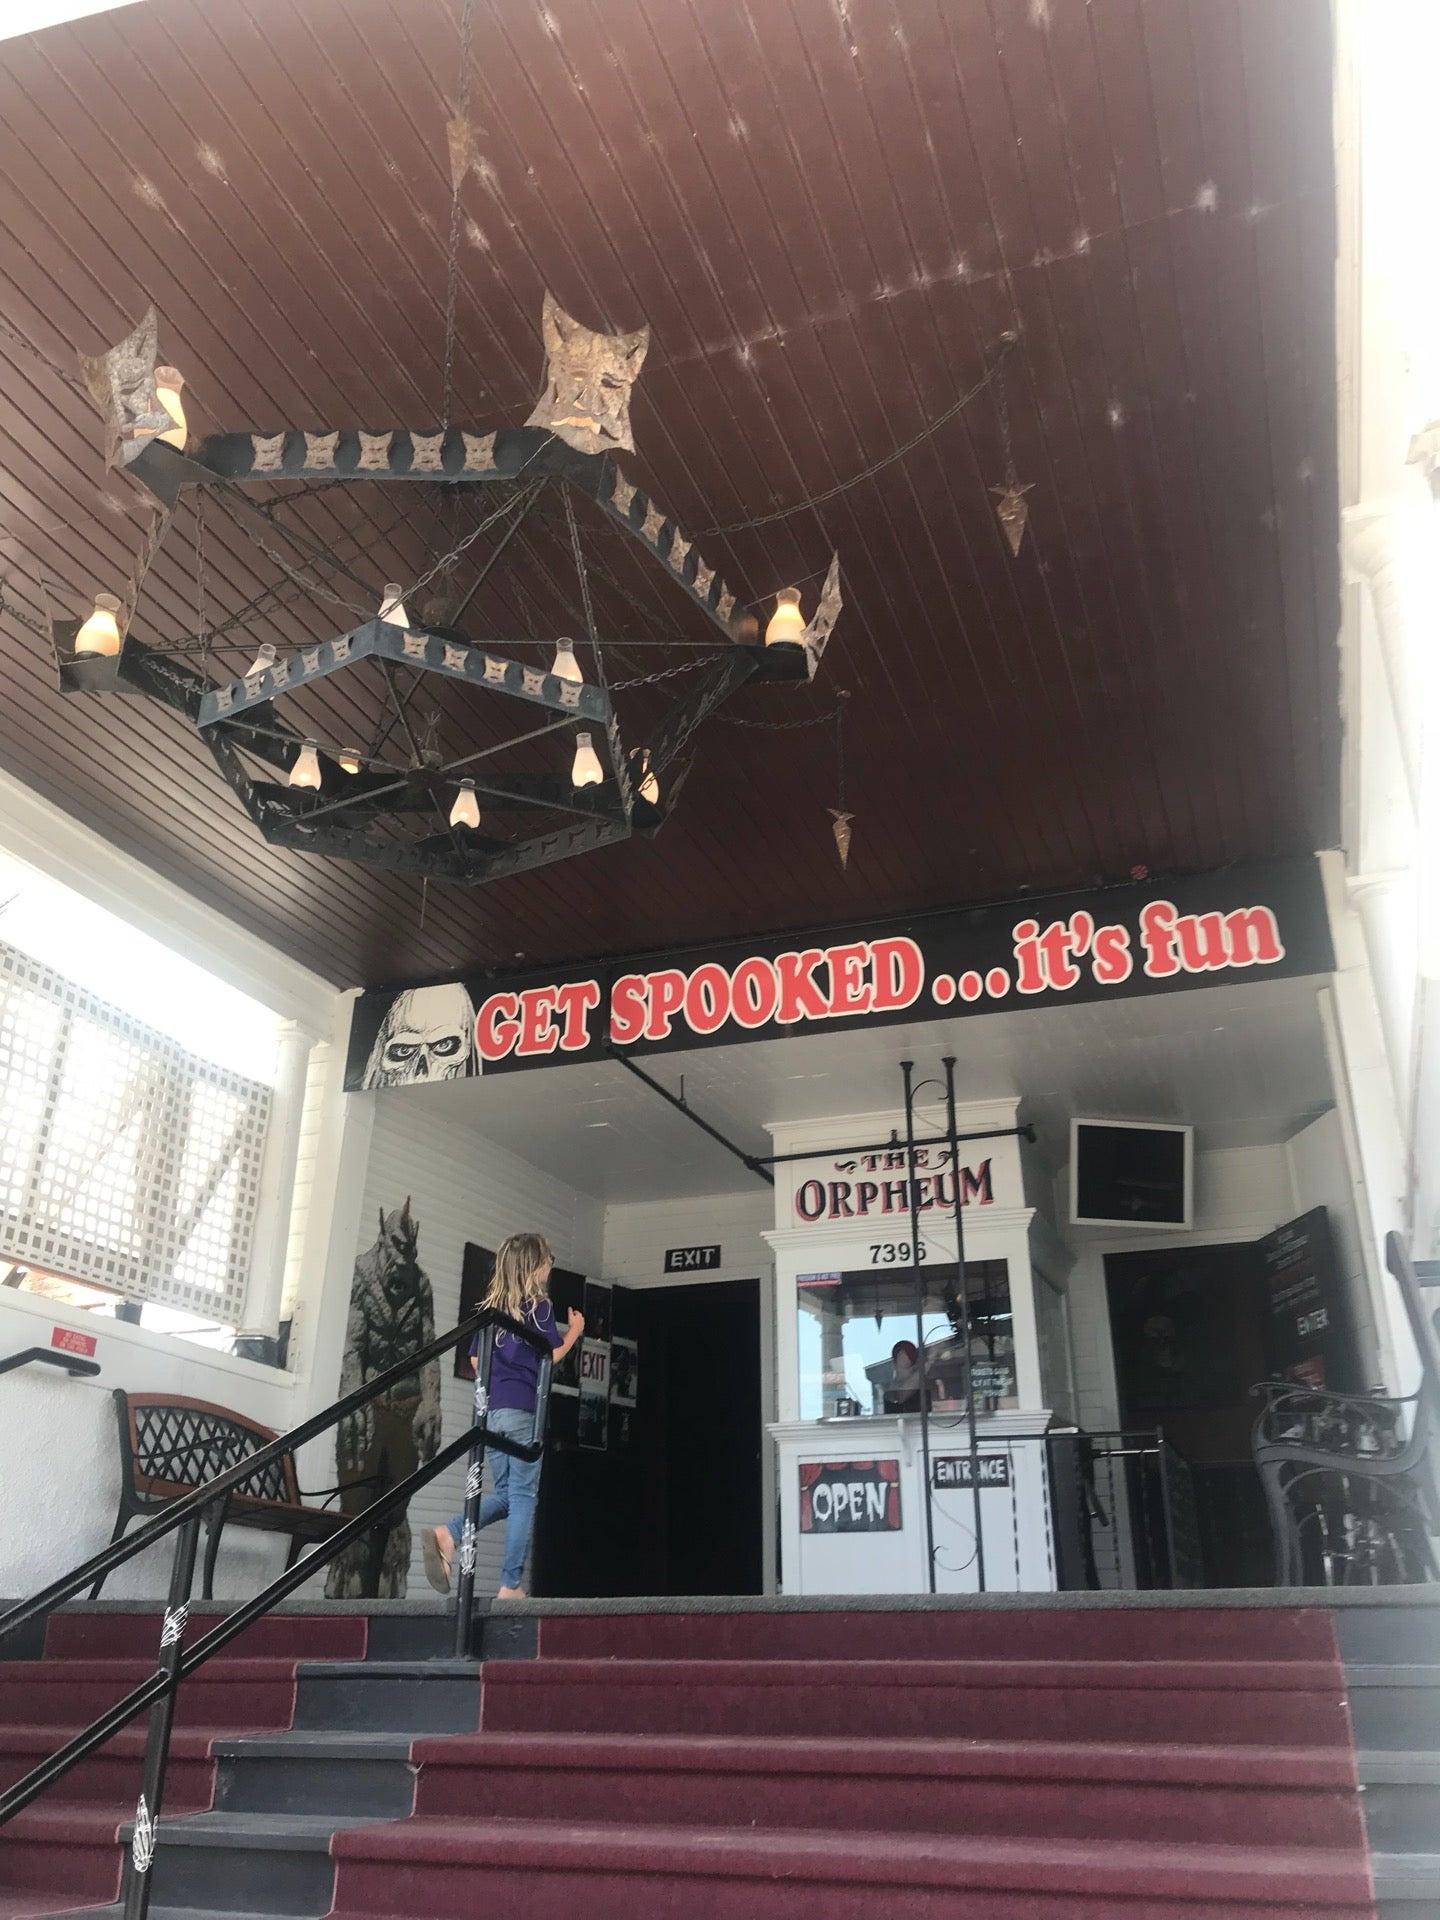 The Haunted Theatre